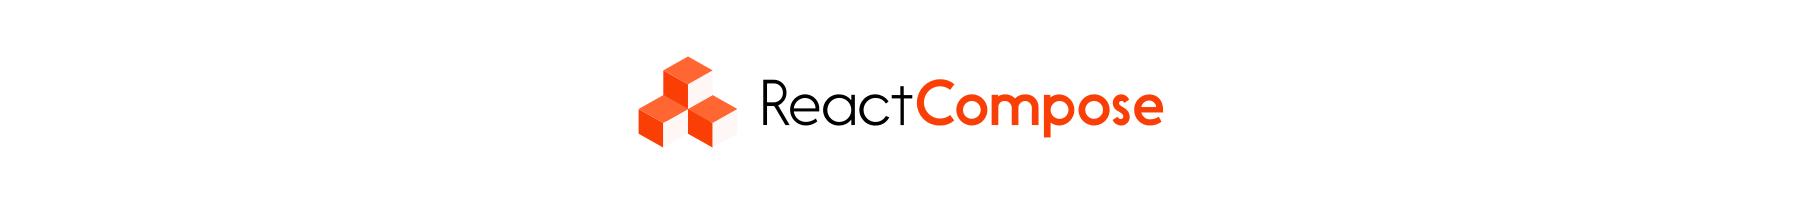 React Compose